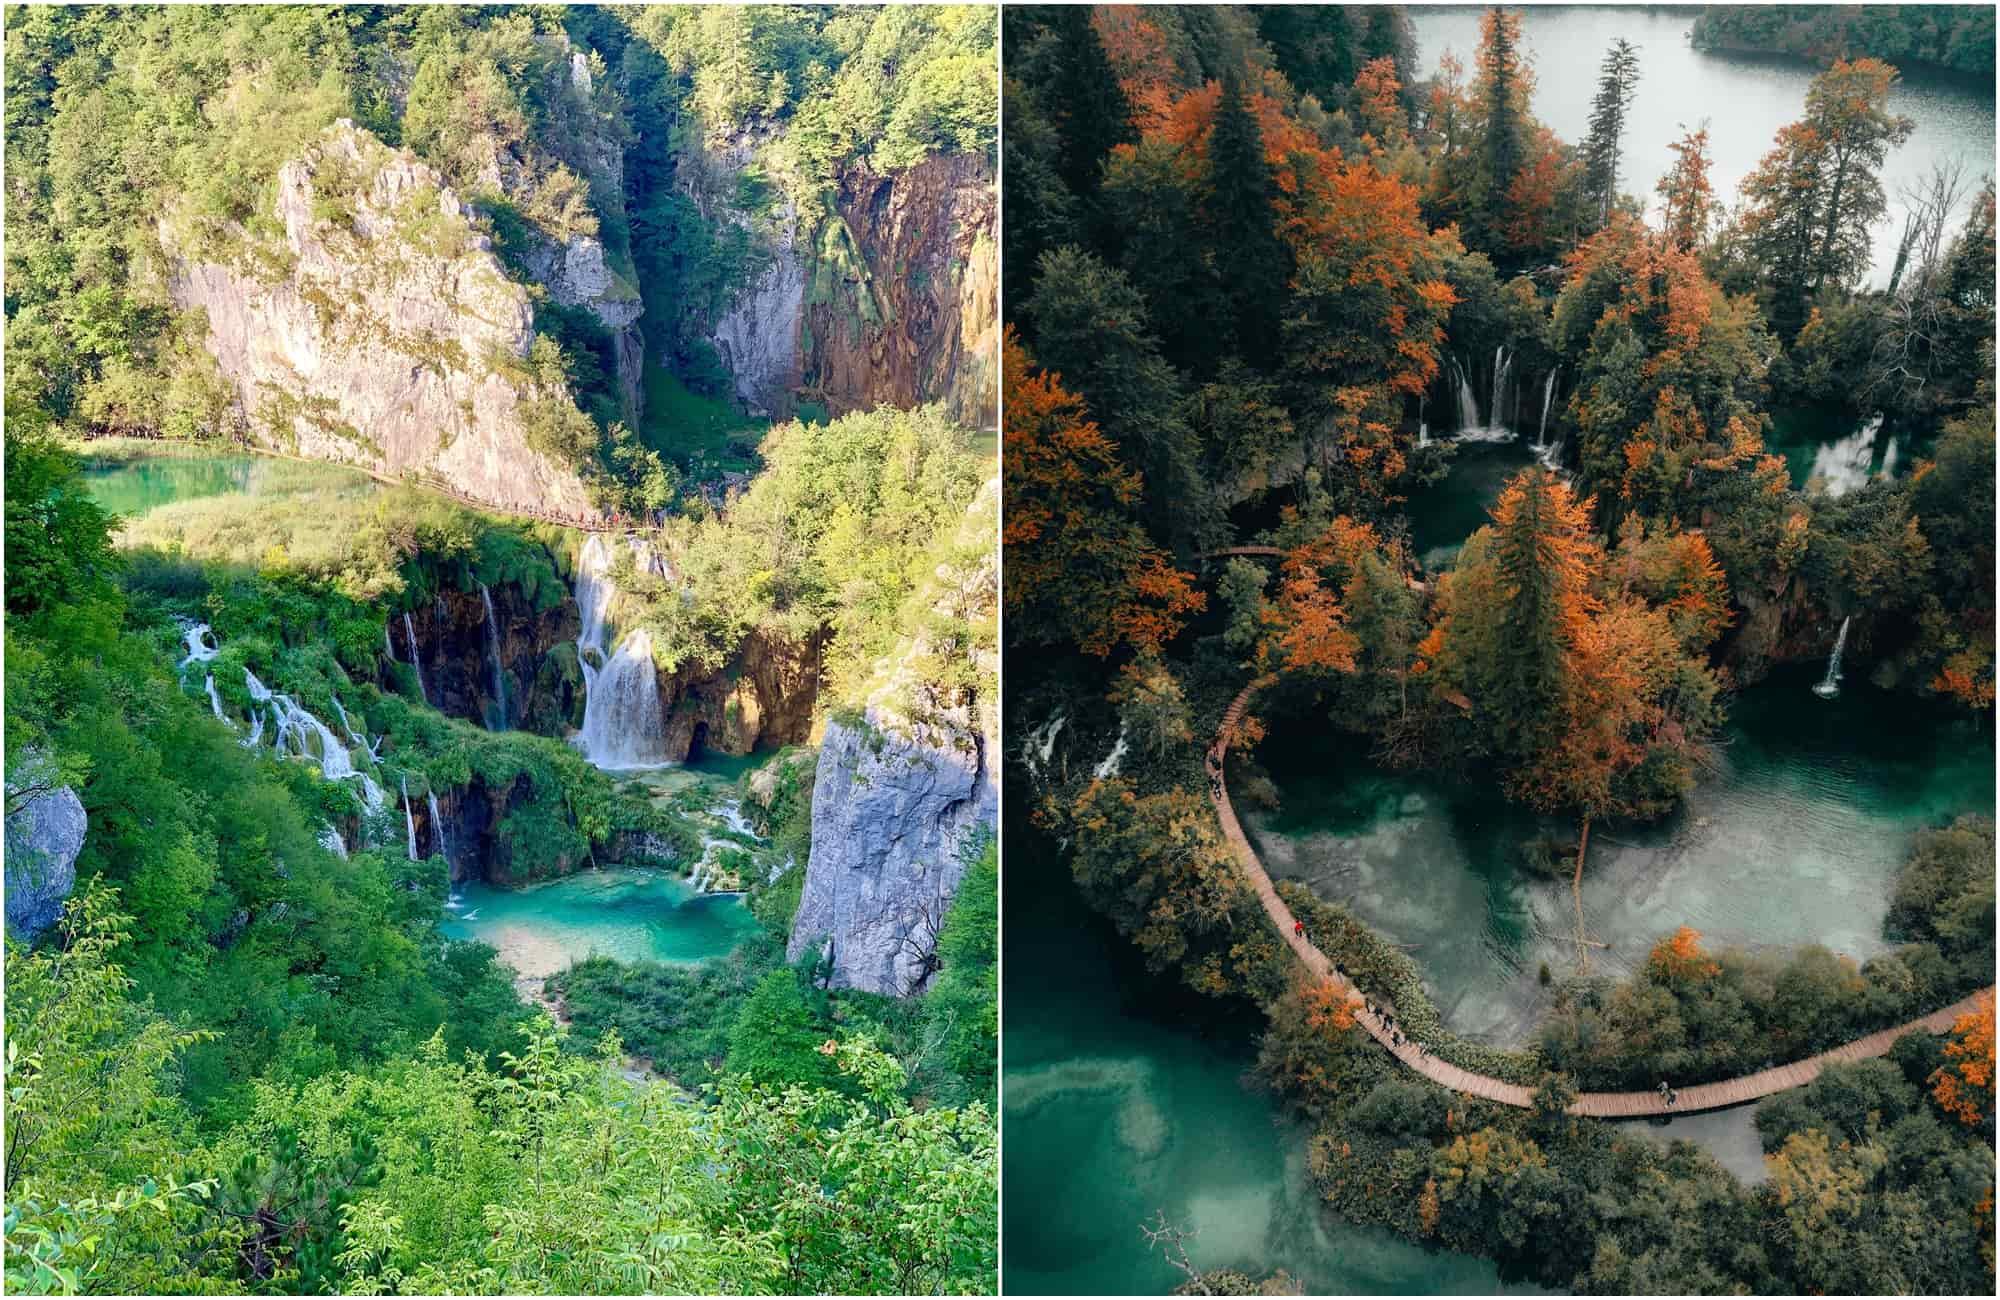 Voyage Croatie - Parc de Plitvice - Amplitudes